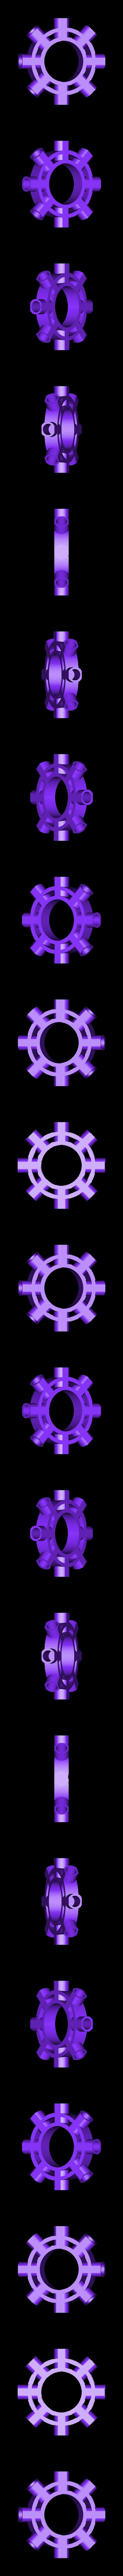 spinner_handwheel_608.stl Download free STL file Handwheel Spinner • Object to 3D print, bda